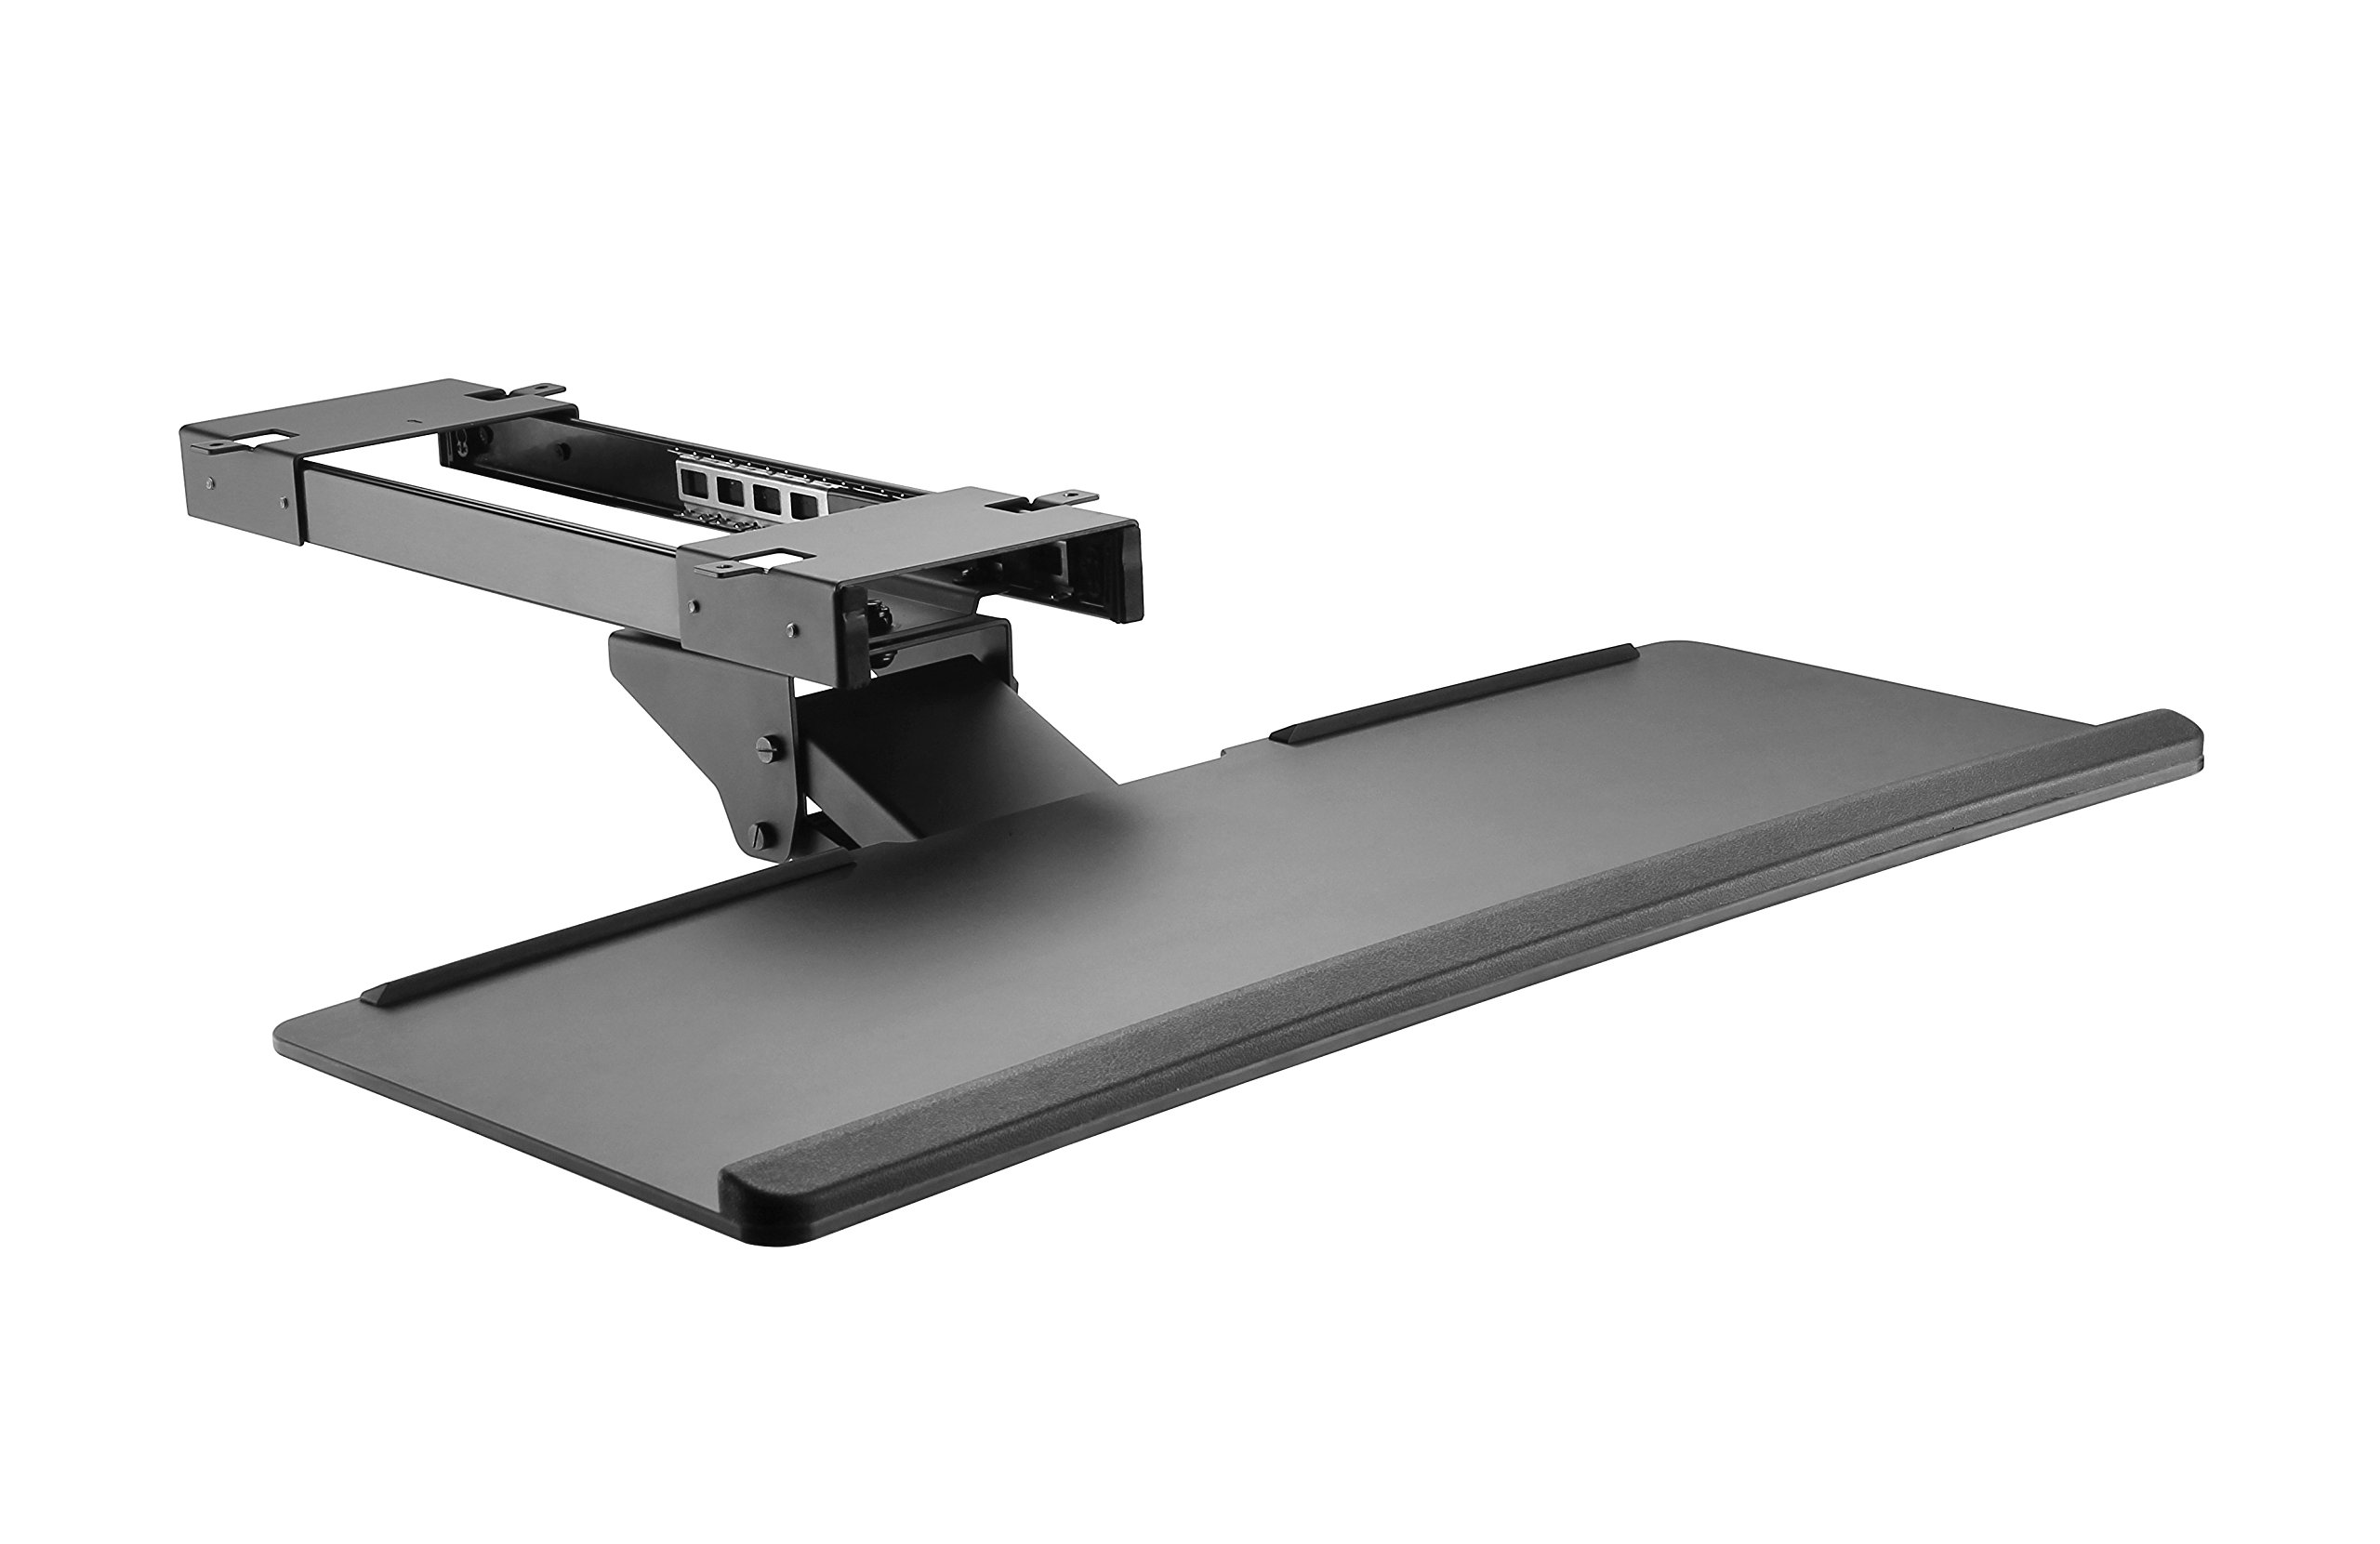 Ergoshopping Adjustable Under Desk Keyboard Tray (B07B2GJCPL) Amazon Price History, Amazon Price Tracker